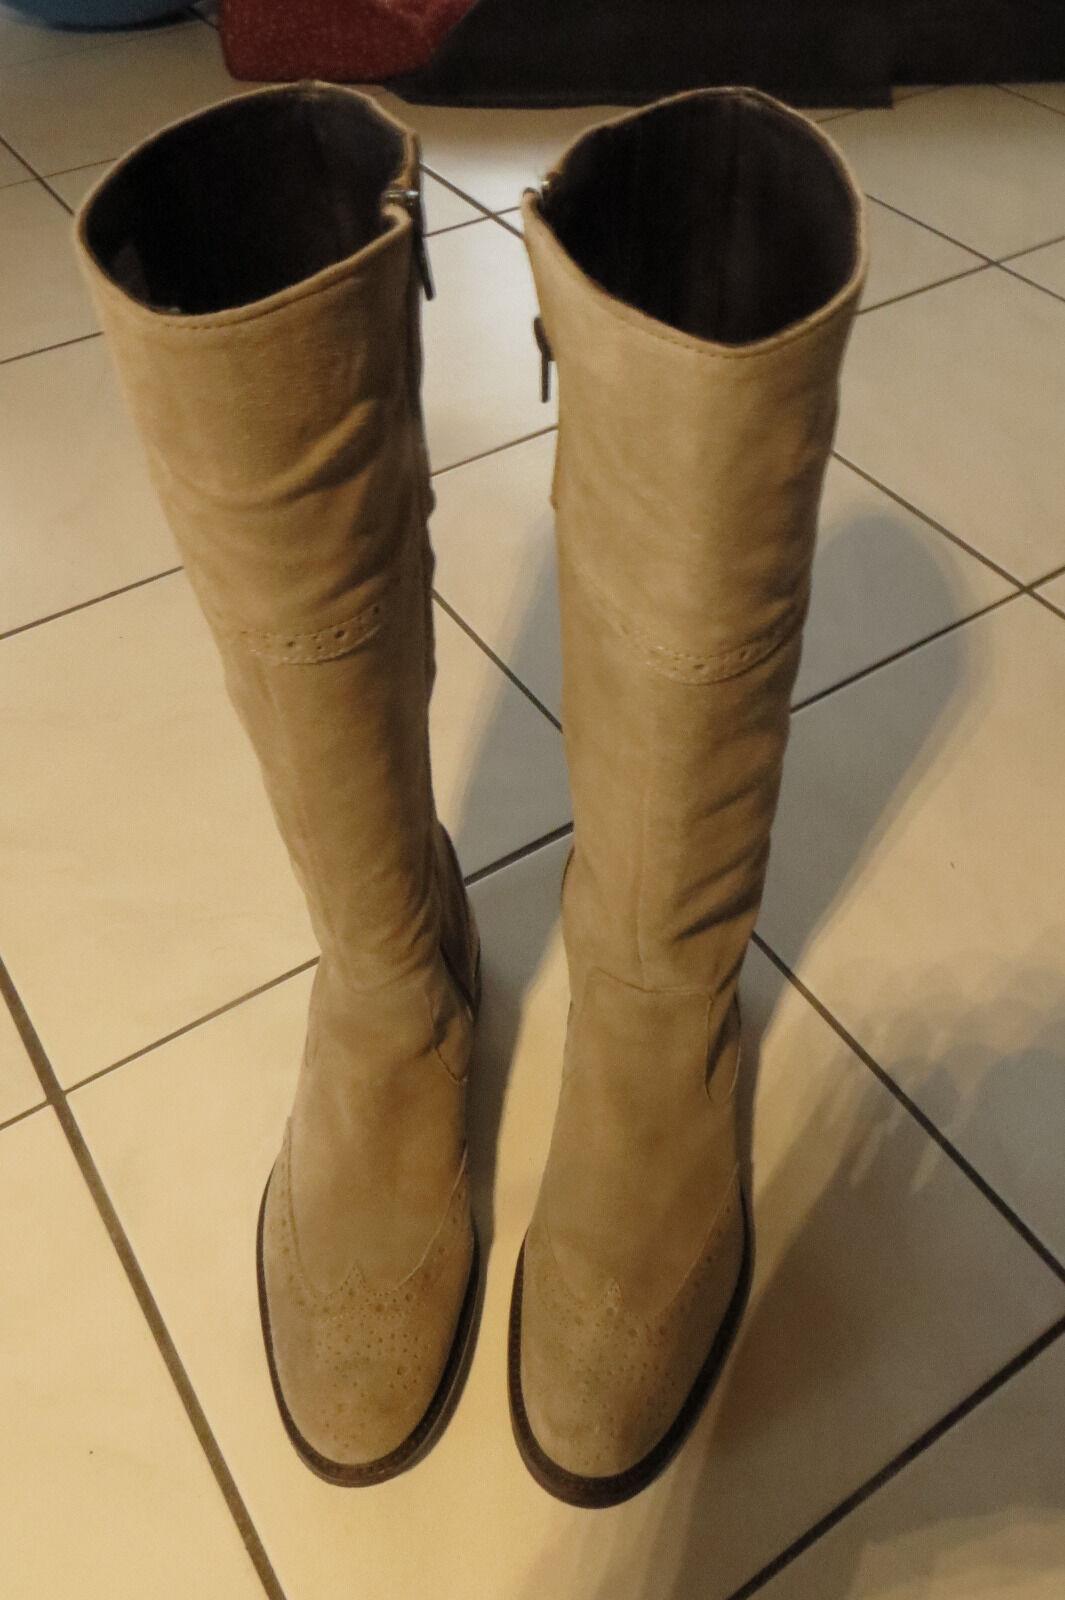 DMN Stiefel Stiefel DMN Gr. 38 braun-grau TOP Zustand b8d468